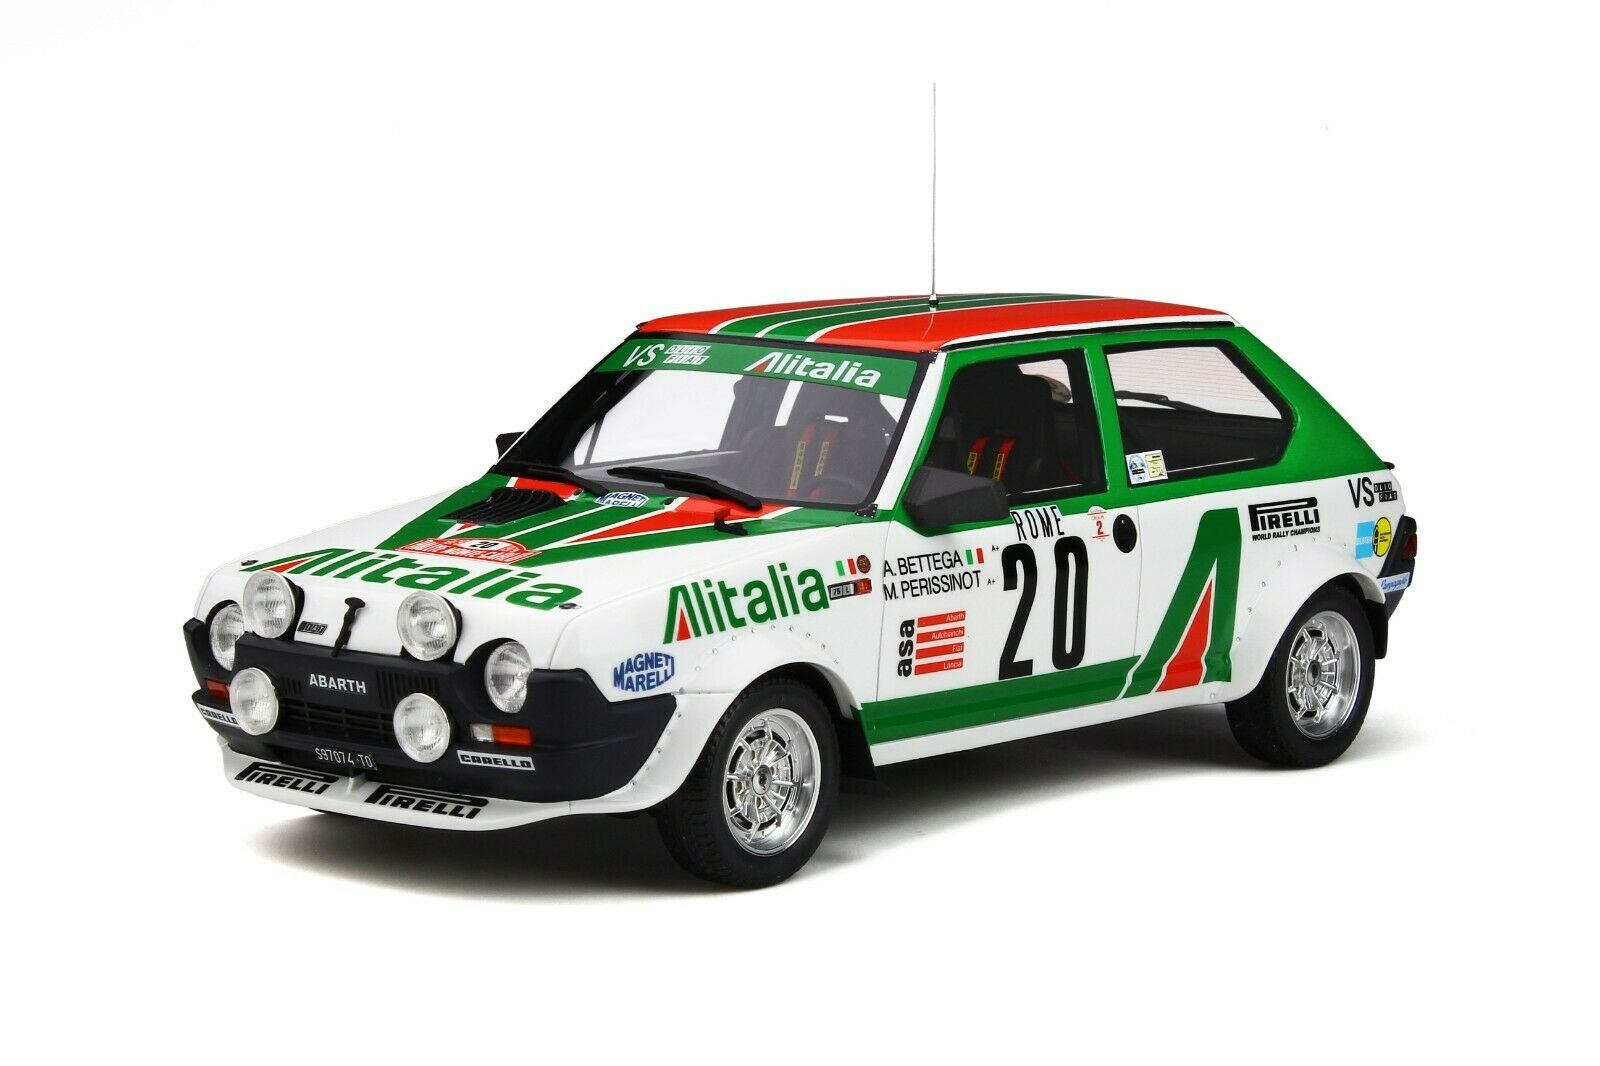 118 Otto modellos OT294 FIat Ritmo Abarth Gr.2 Bettega Rtuttiye Monte autolo 1979